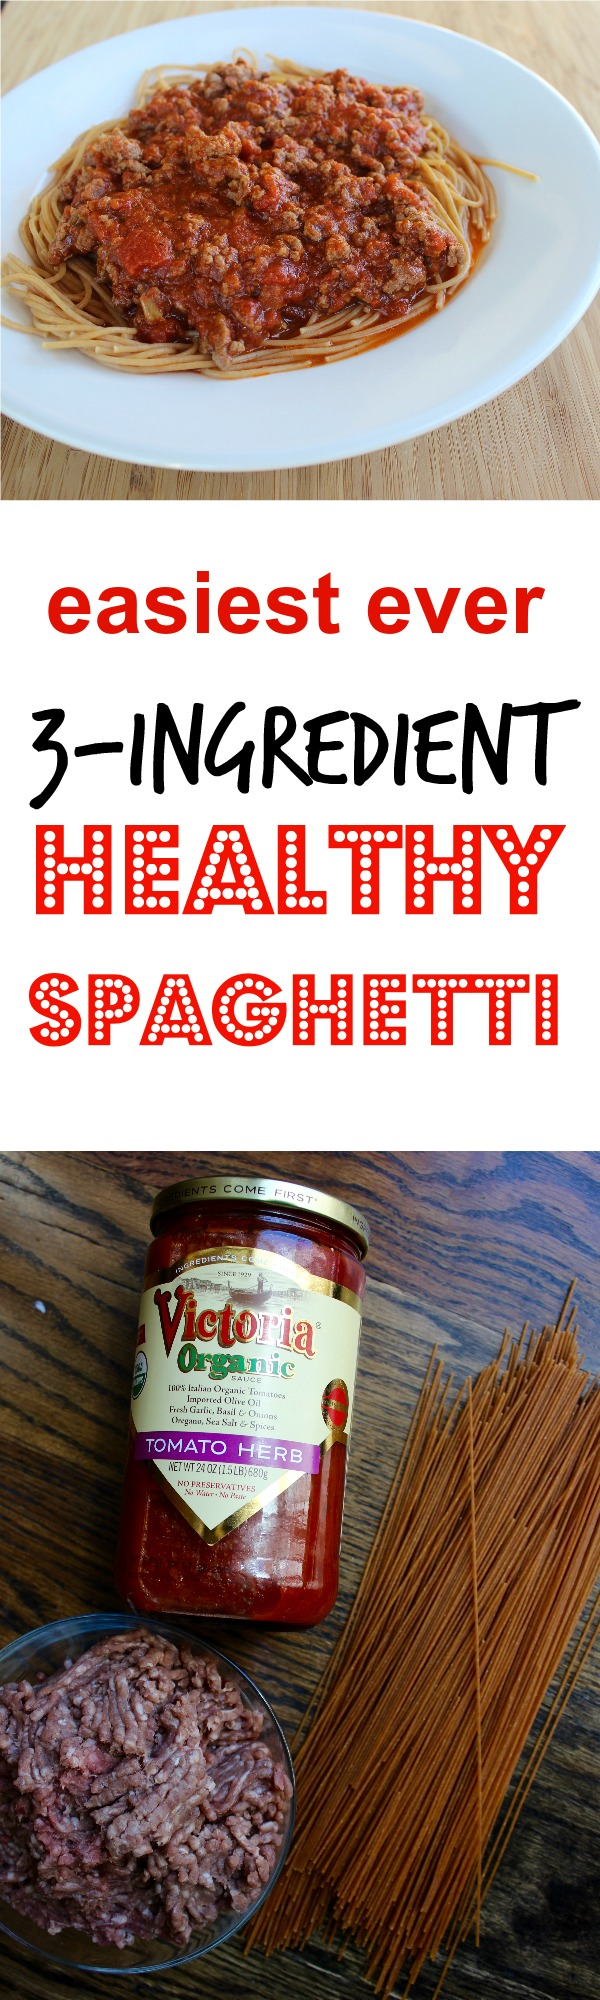 easiest ever 3 ingredient healthy spaghetti